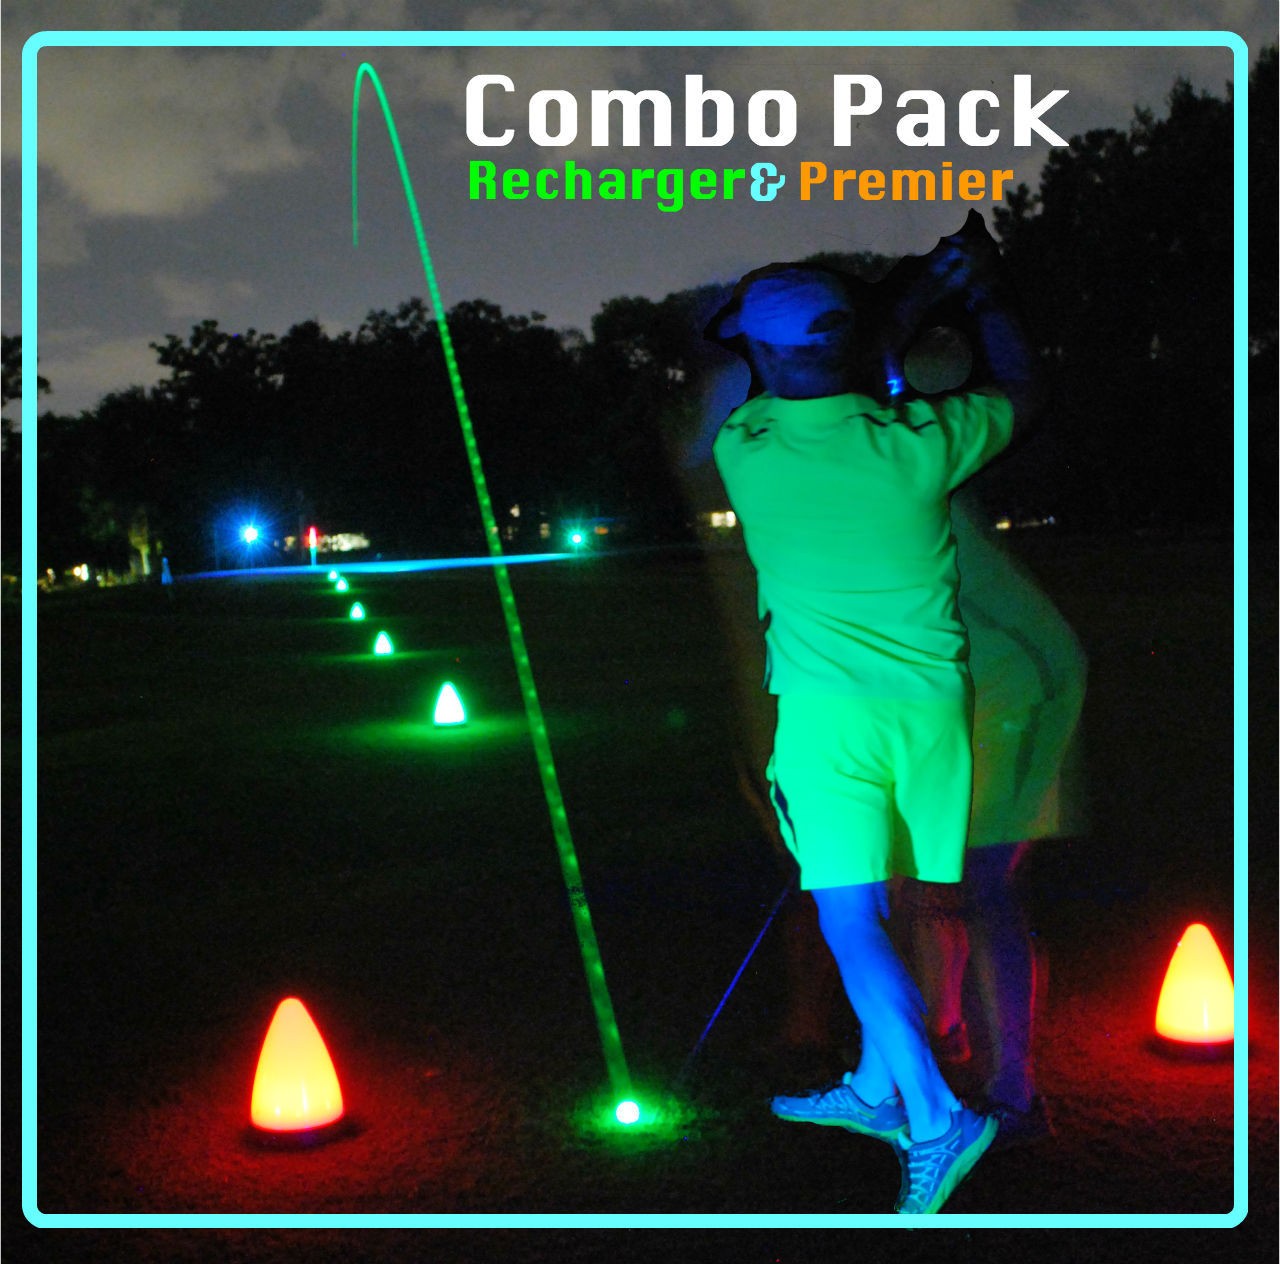 COMBO PACK – Recharger & Premier 1